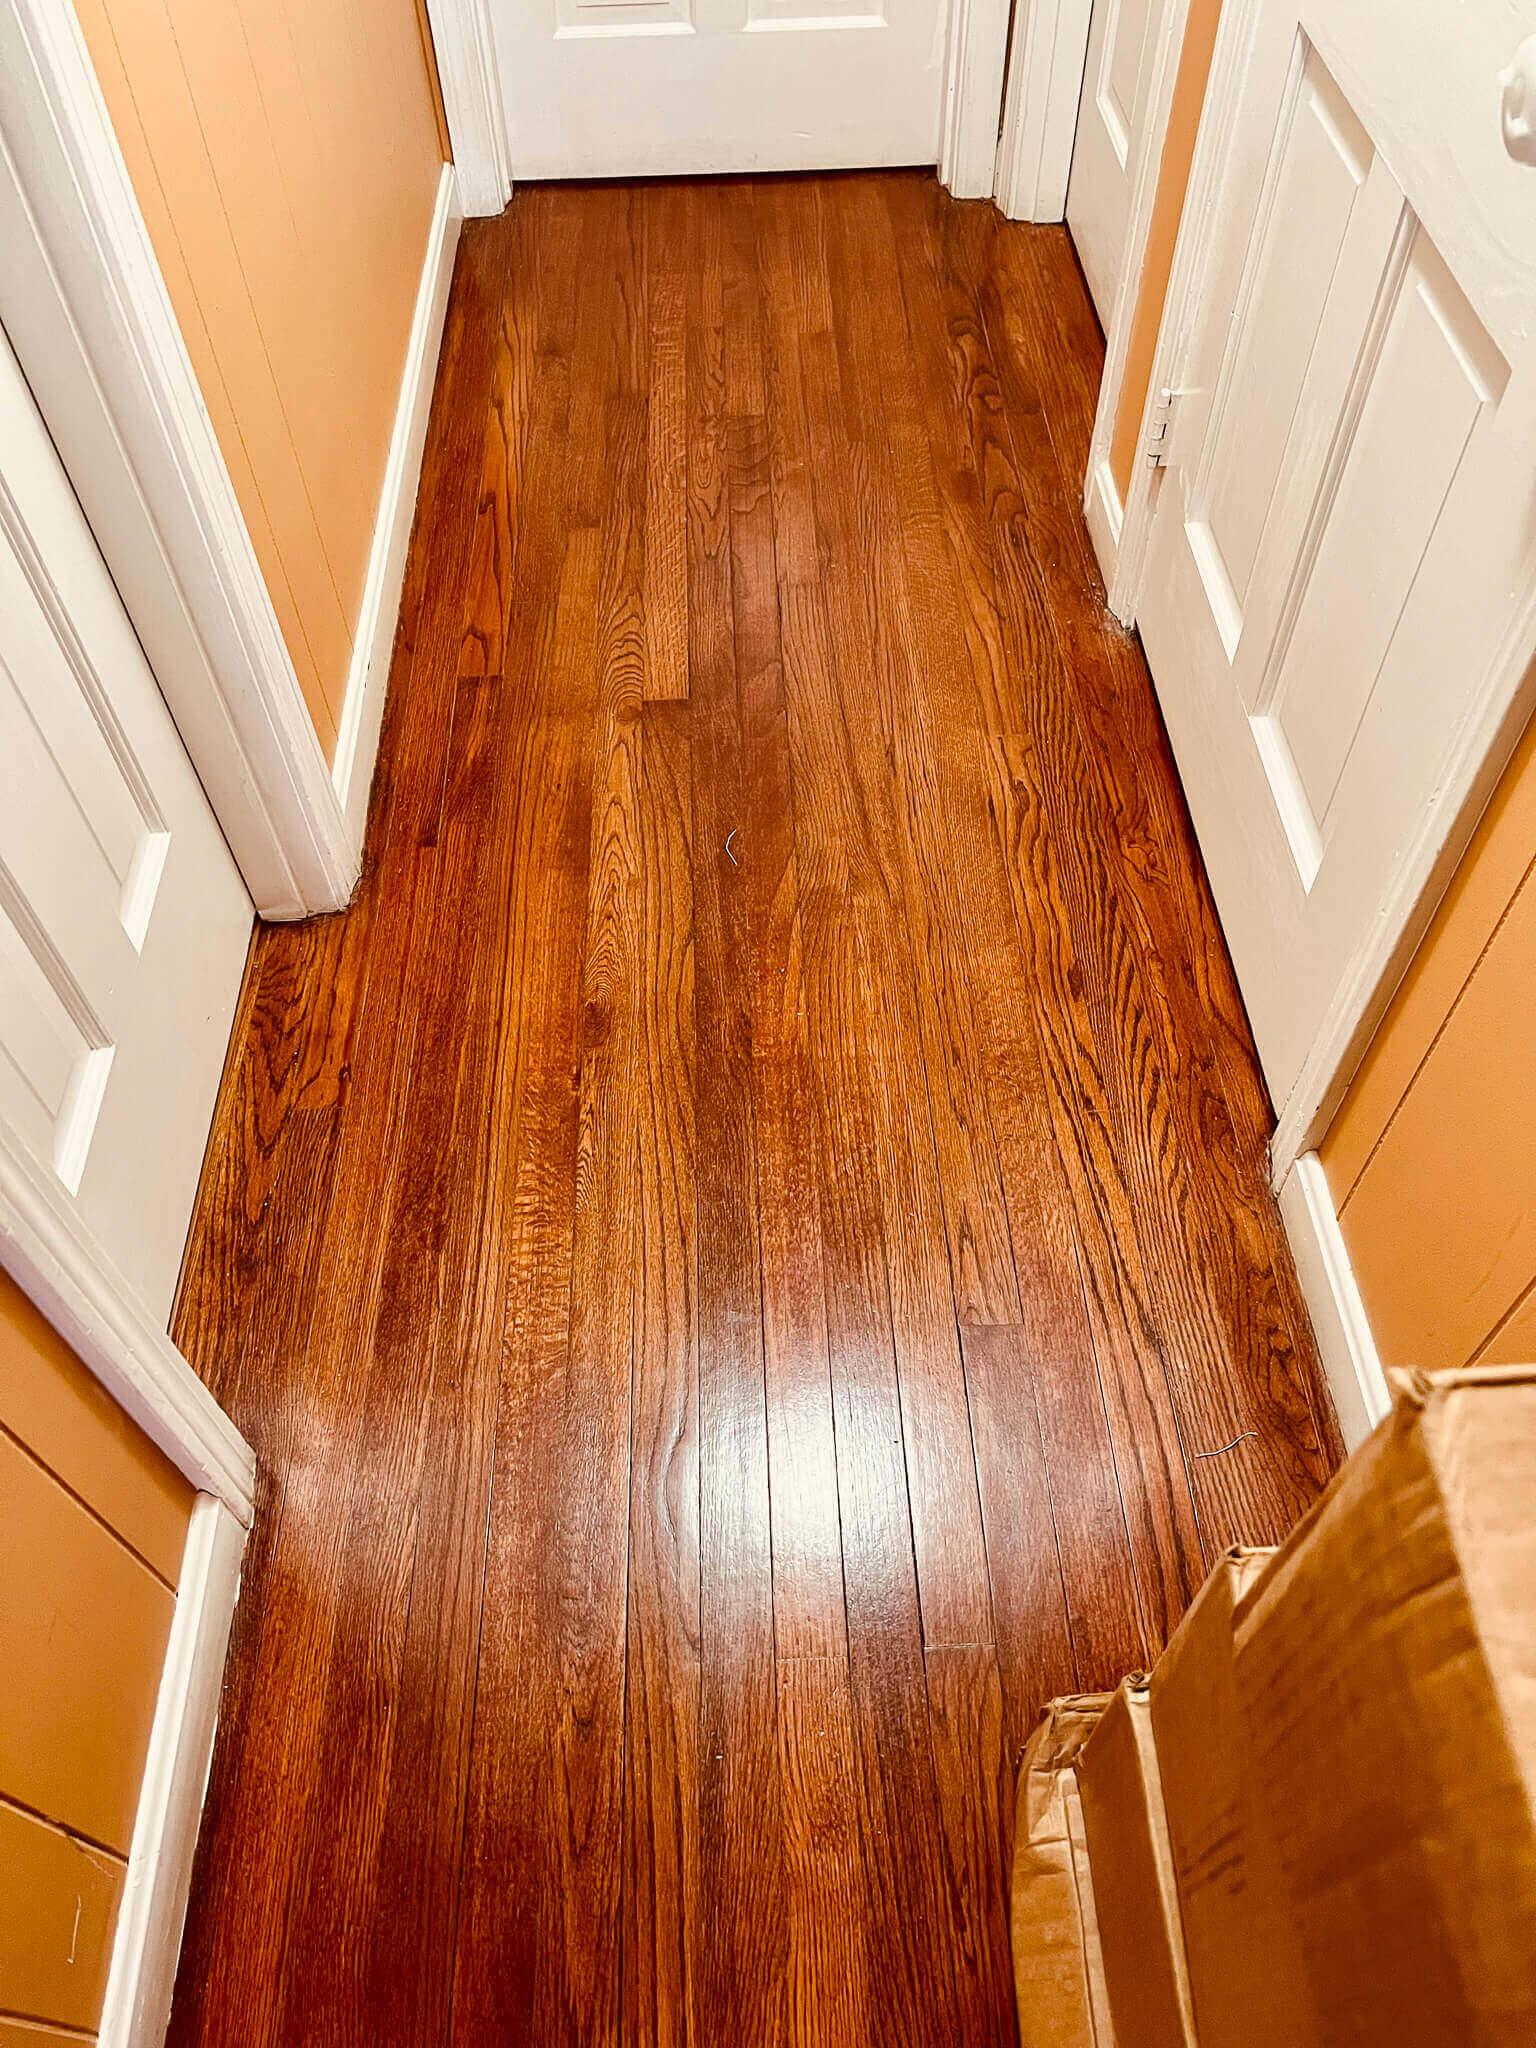 Clean floor with murphy's oil soap